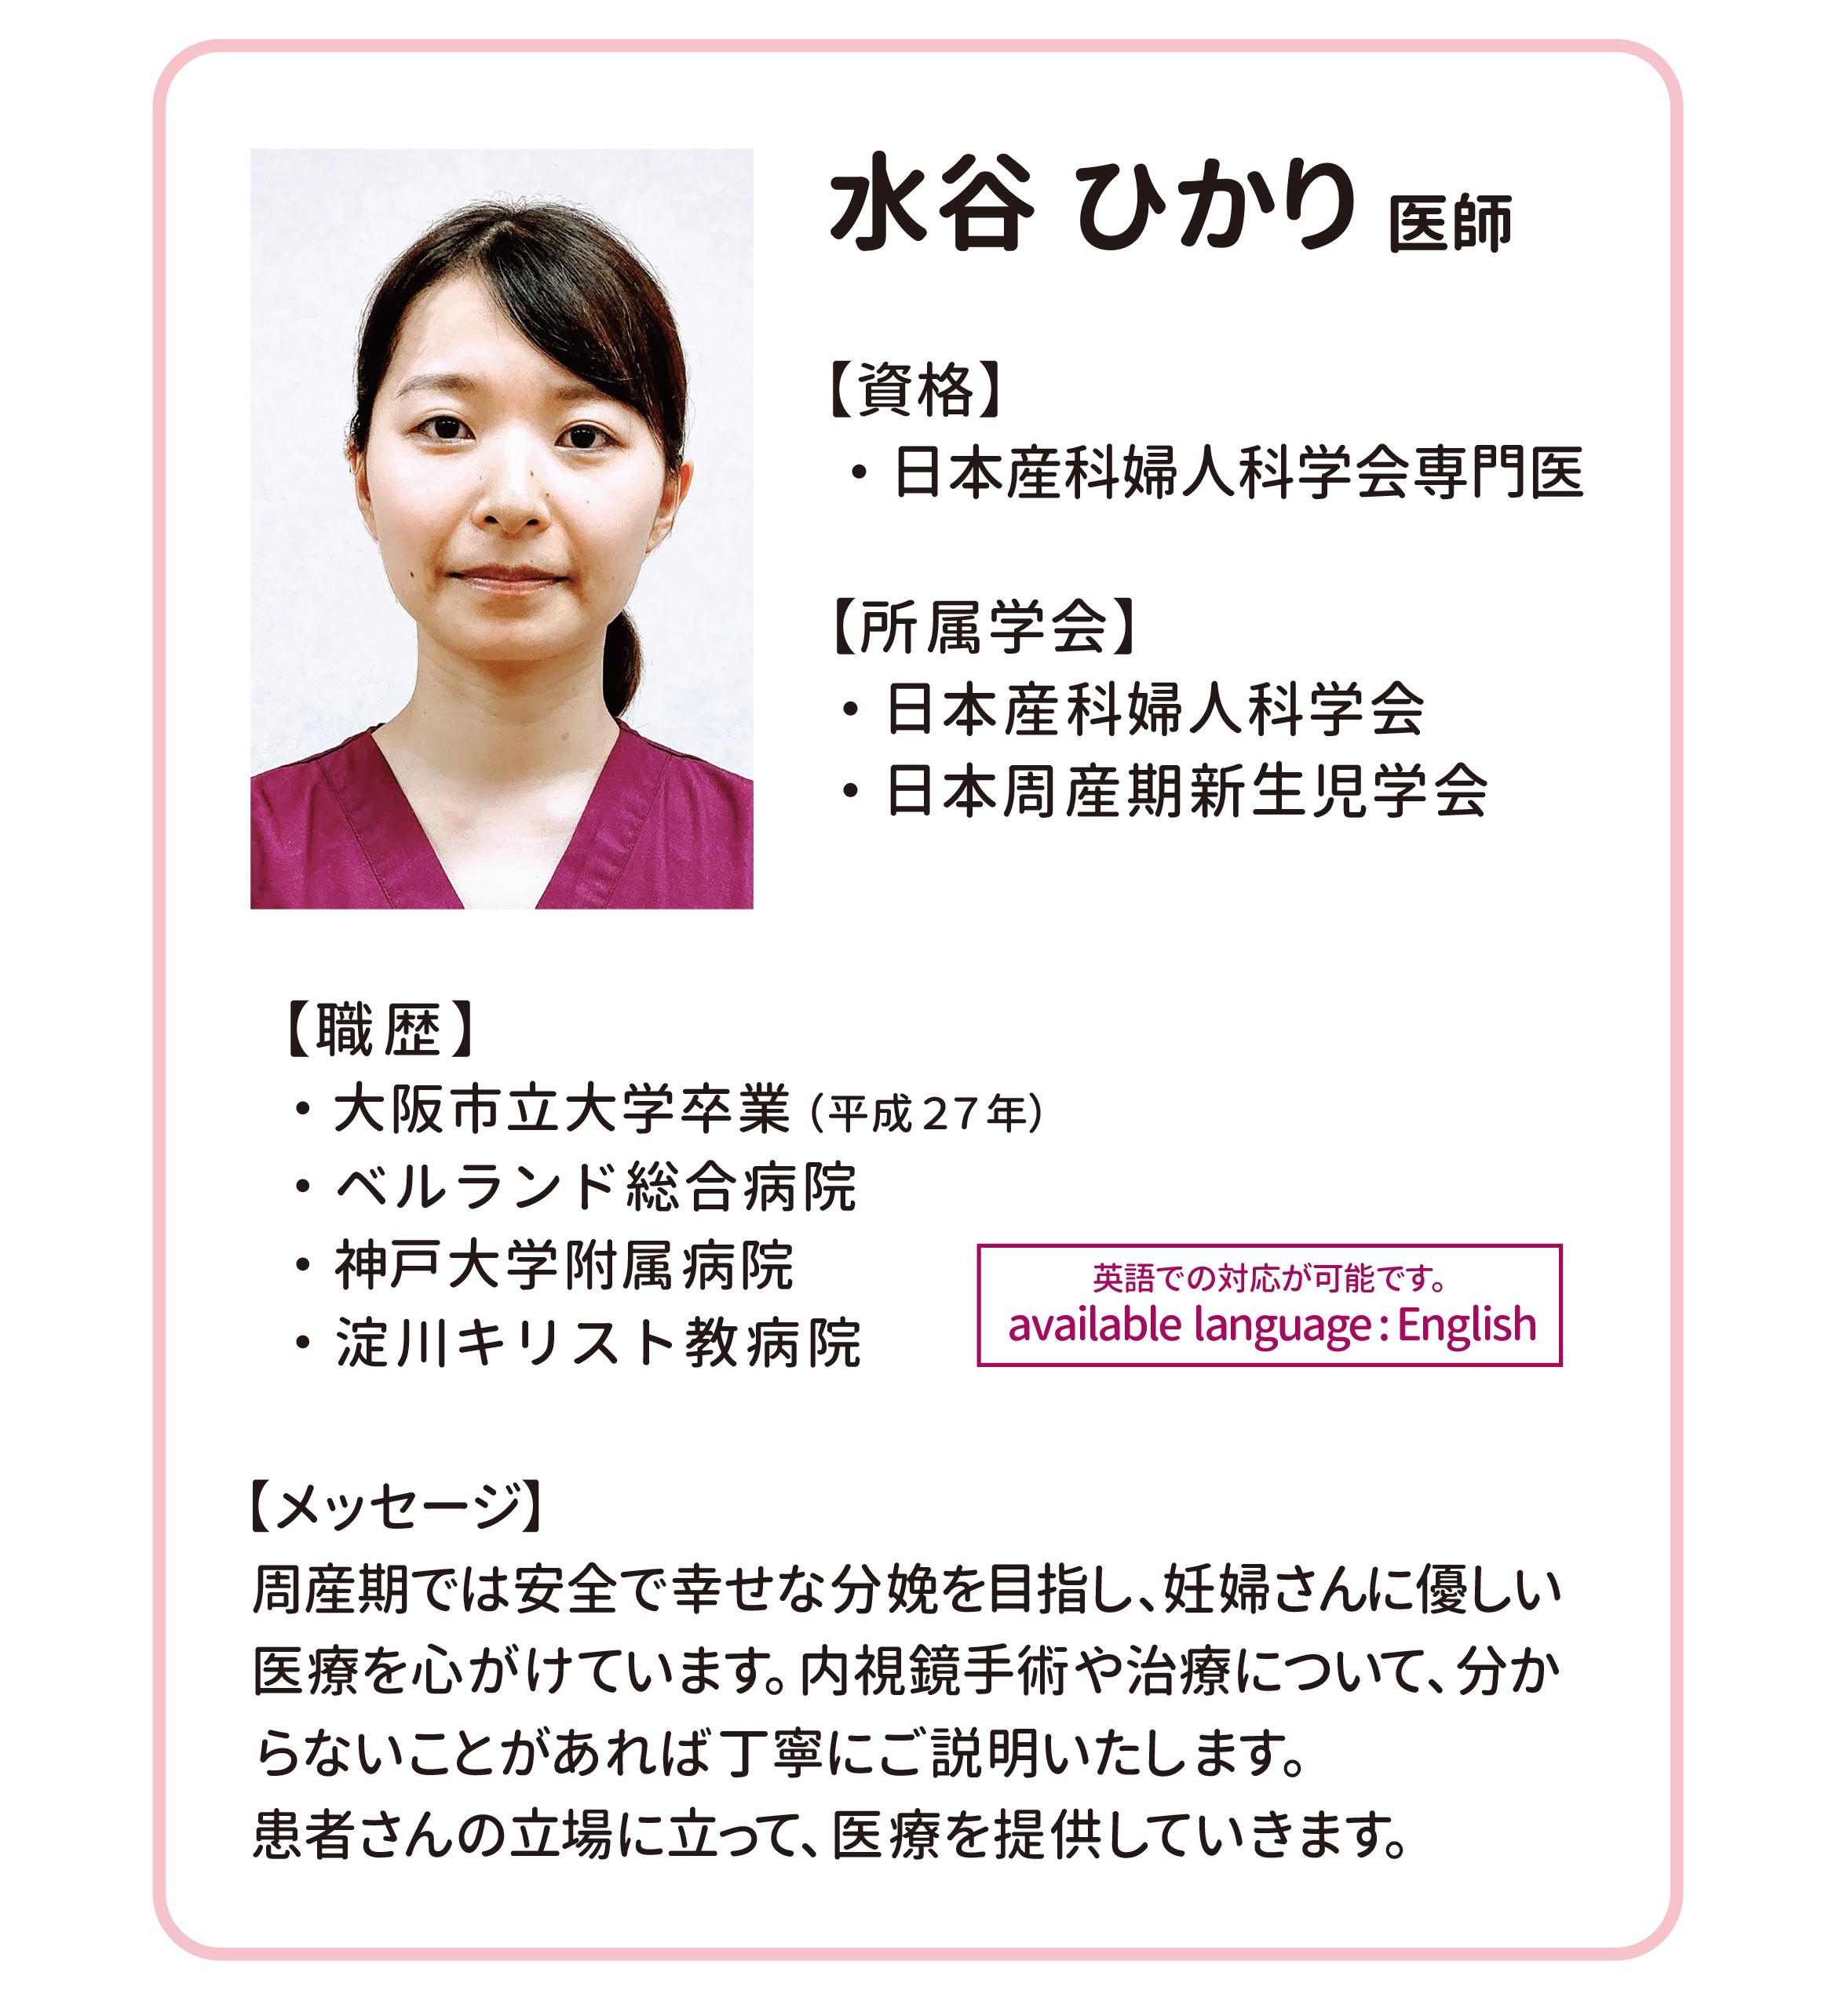 info_DRintro_Mizutani